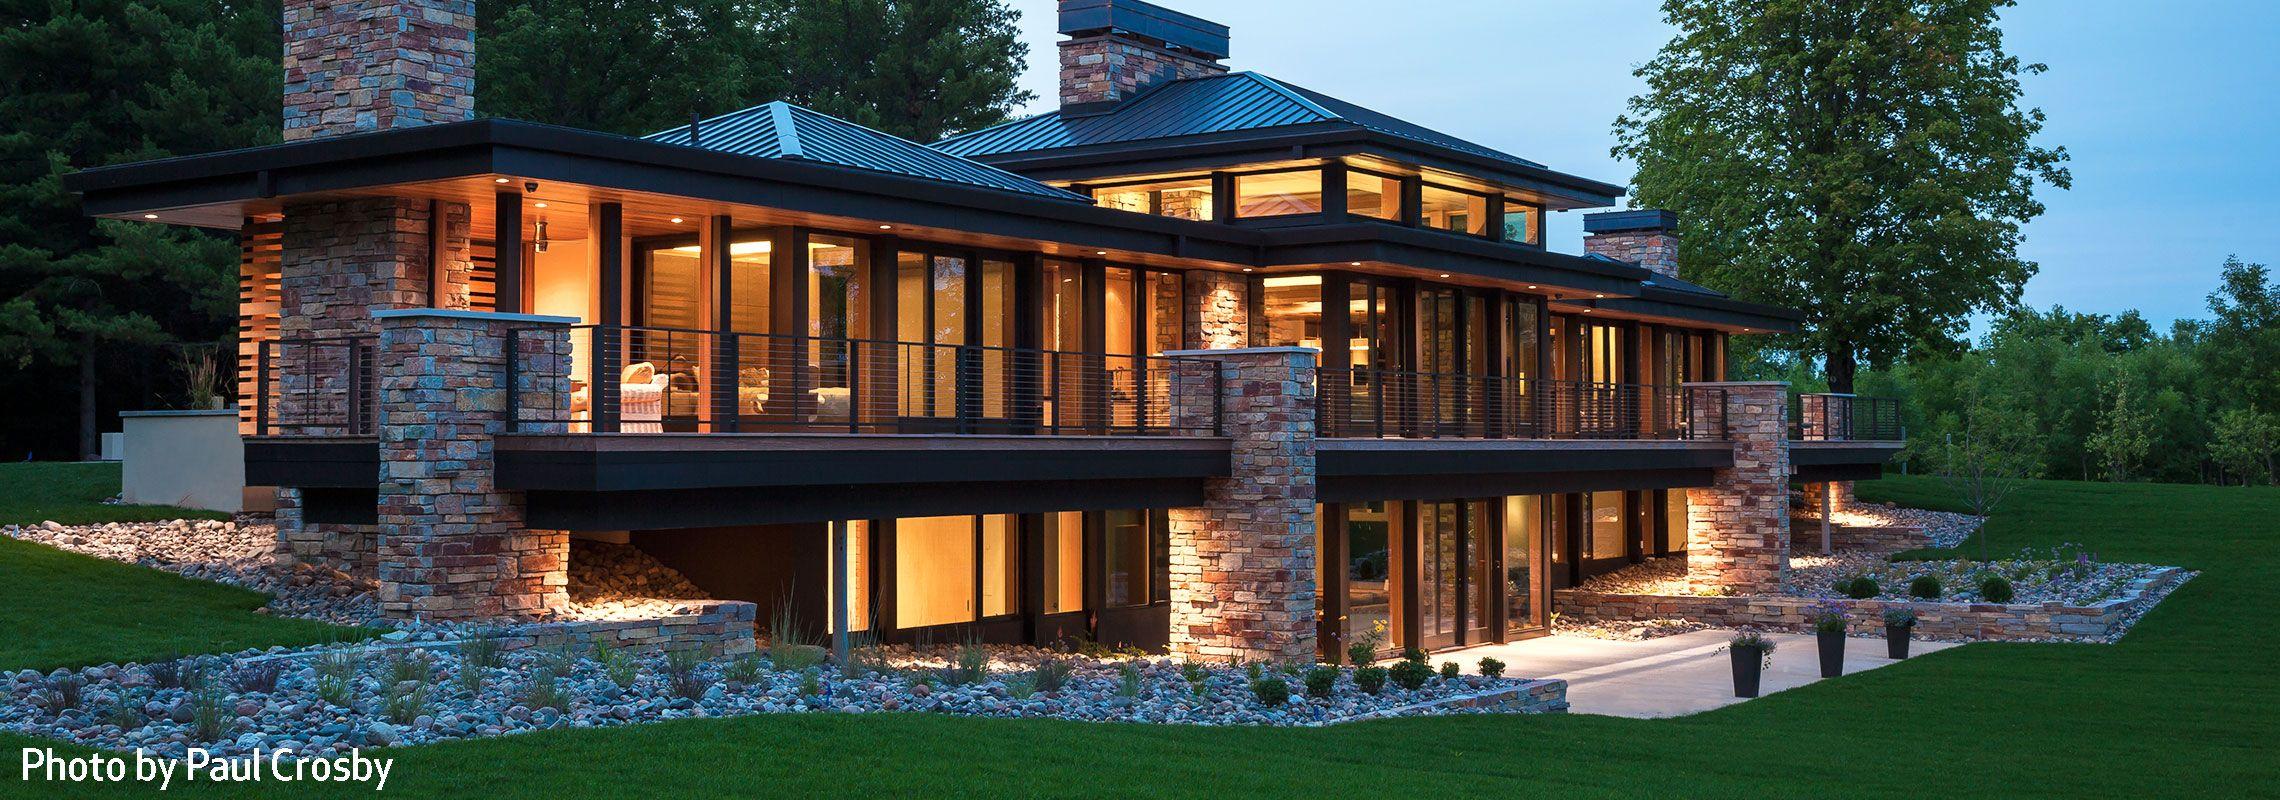 Tour homes aia minnesota charles  stinson also architecture home rh pinterest